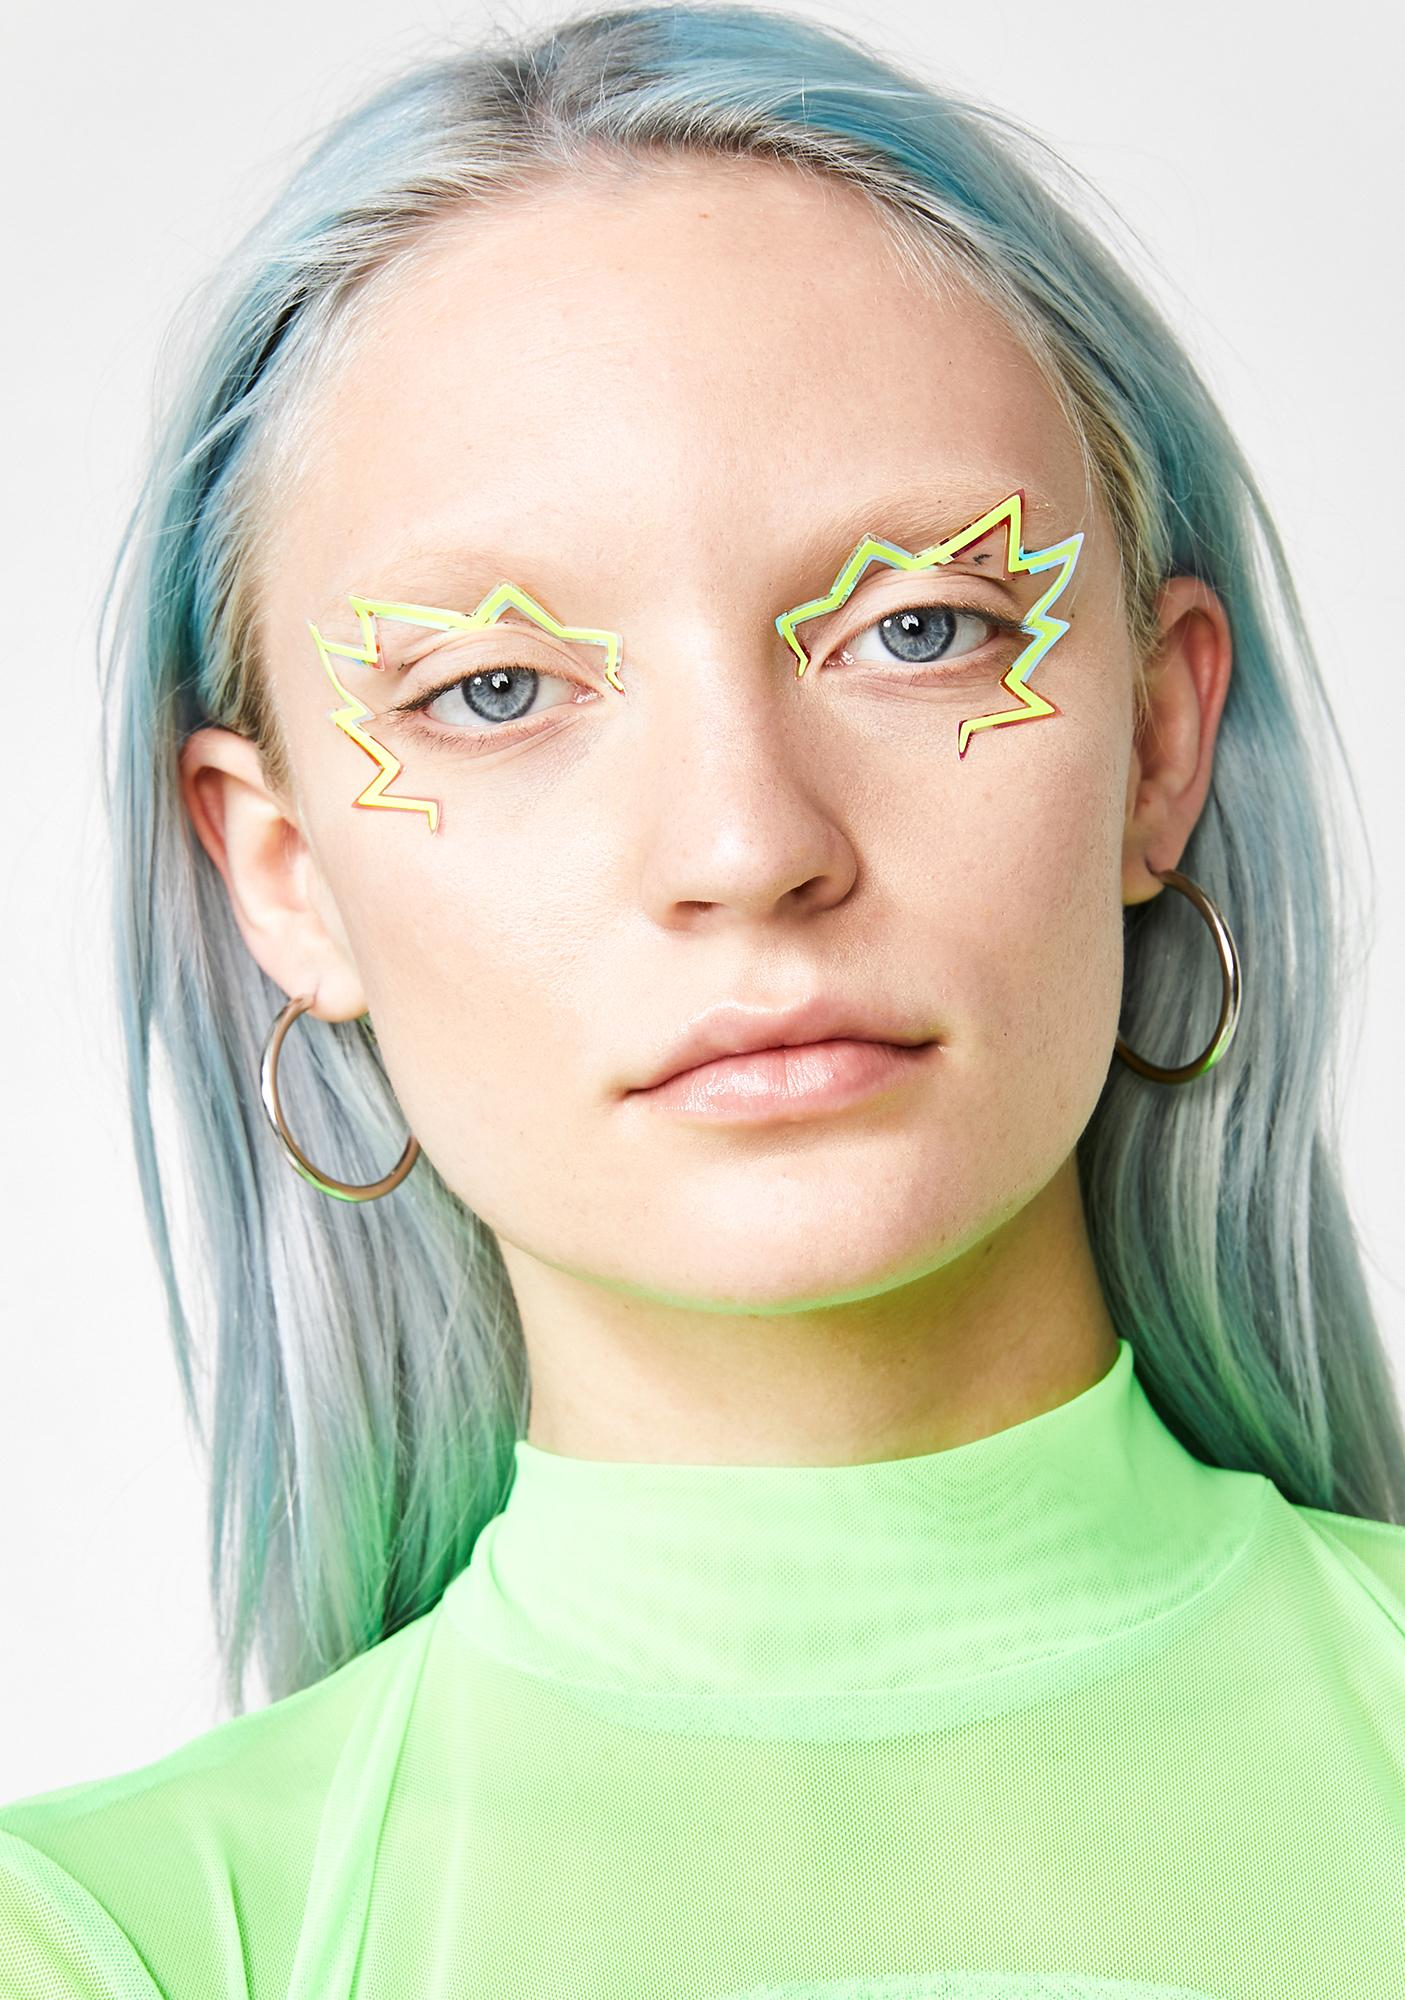 Face Lace Flash Glance